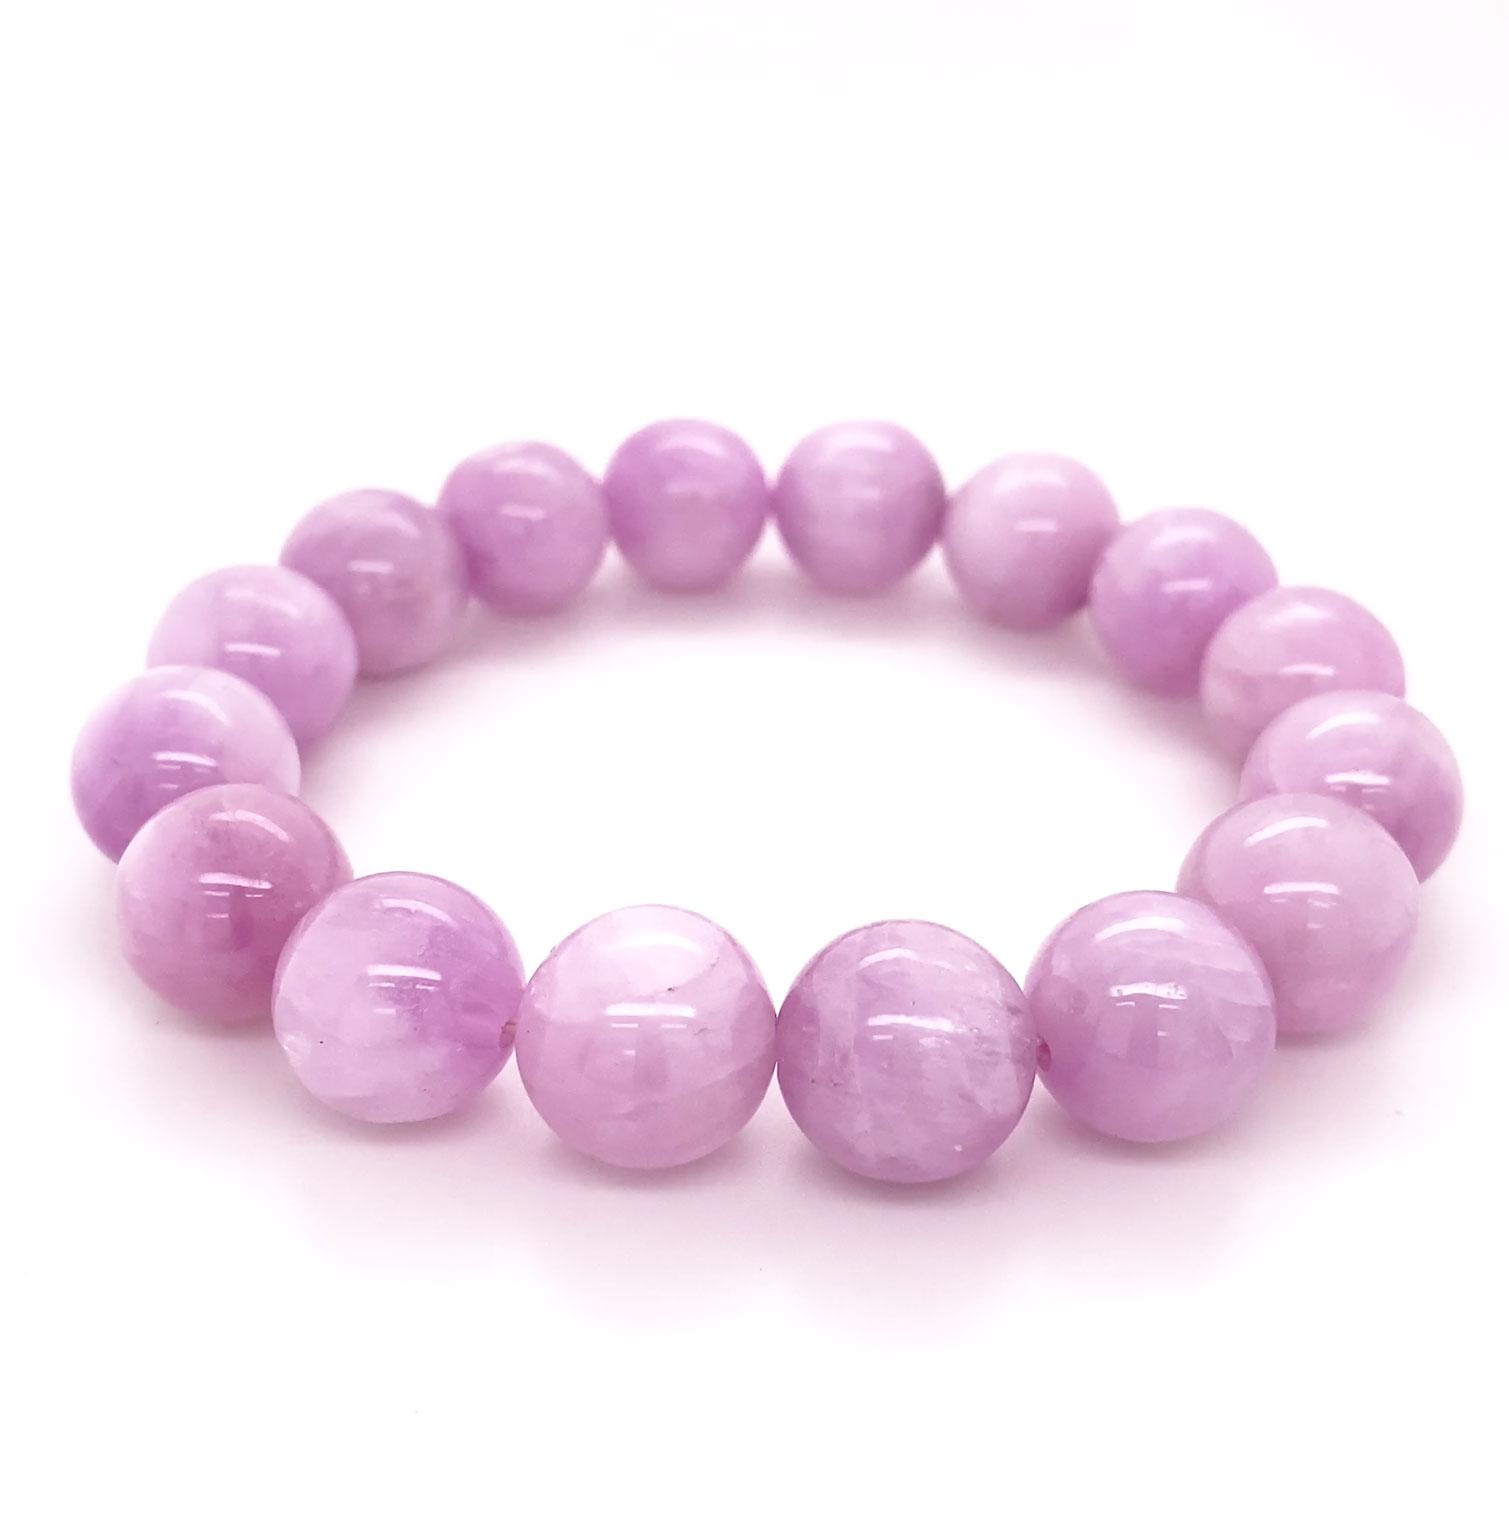 A luscious pink Kunzite, large sphere bracelet on expandable cord. Rare and captivatingly feminine!